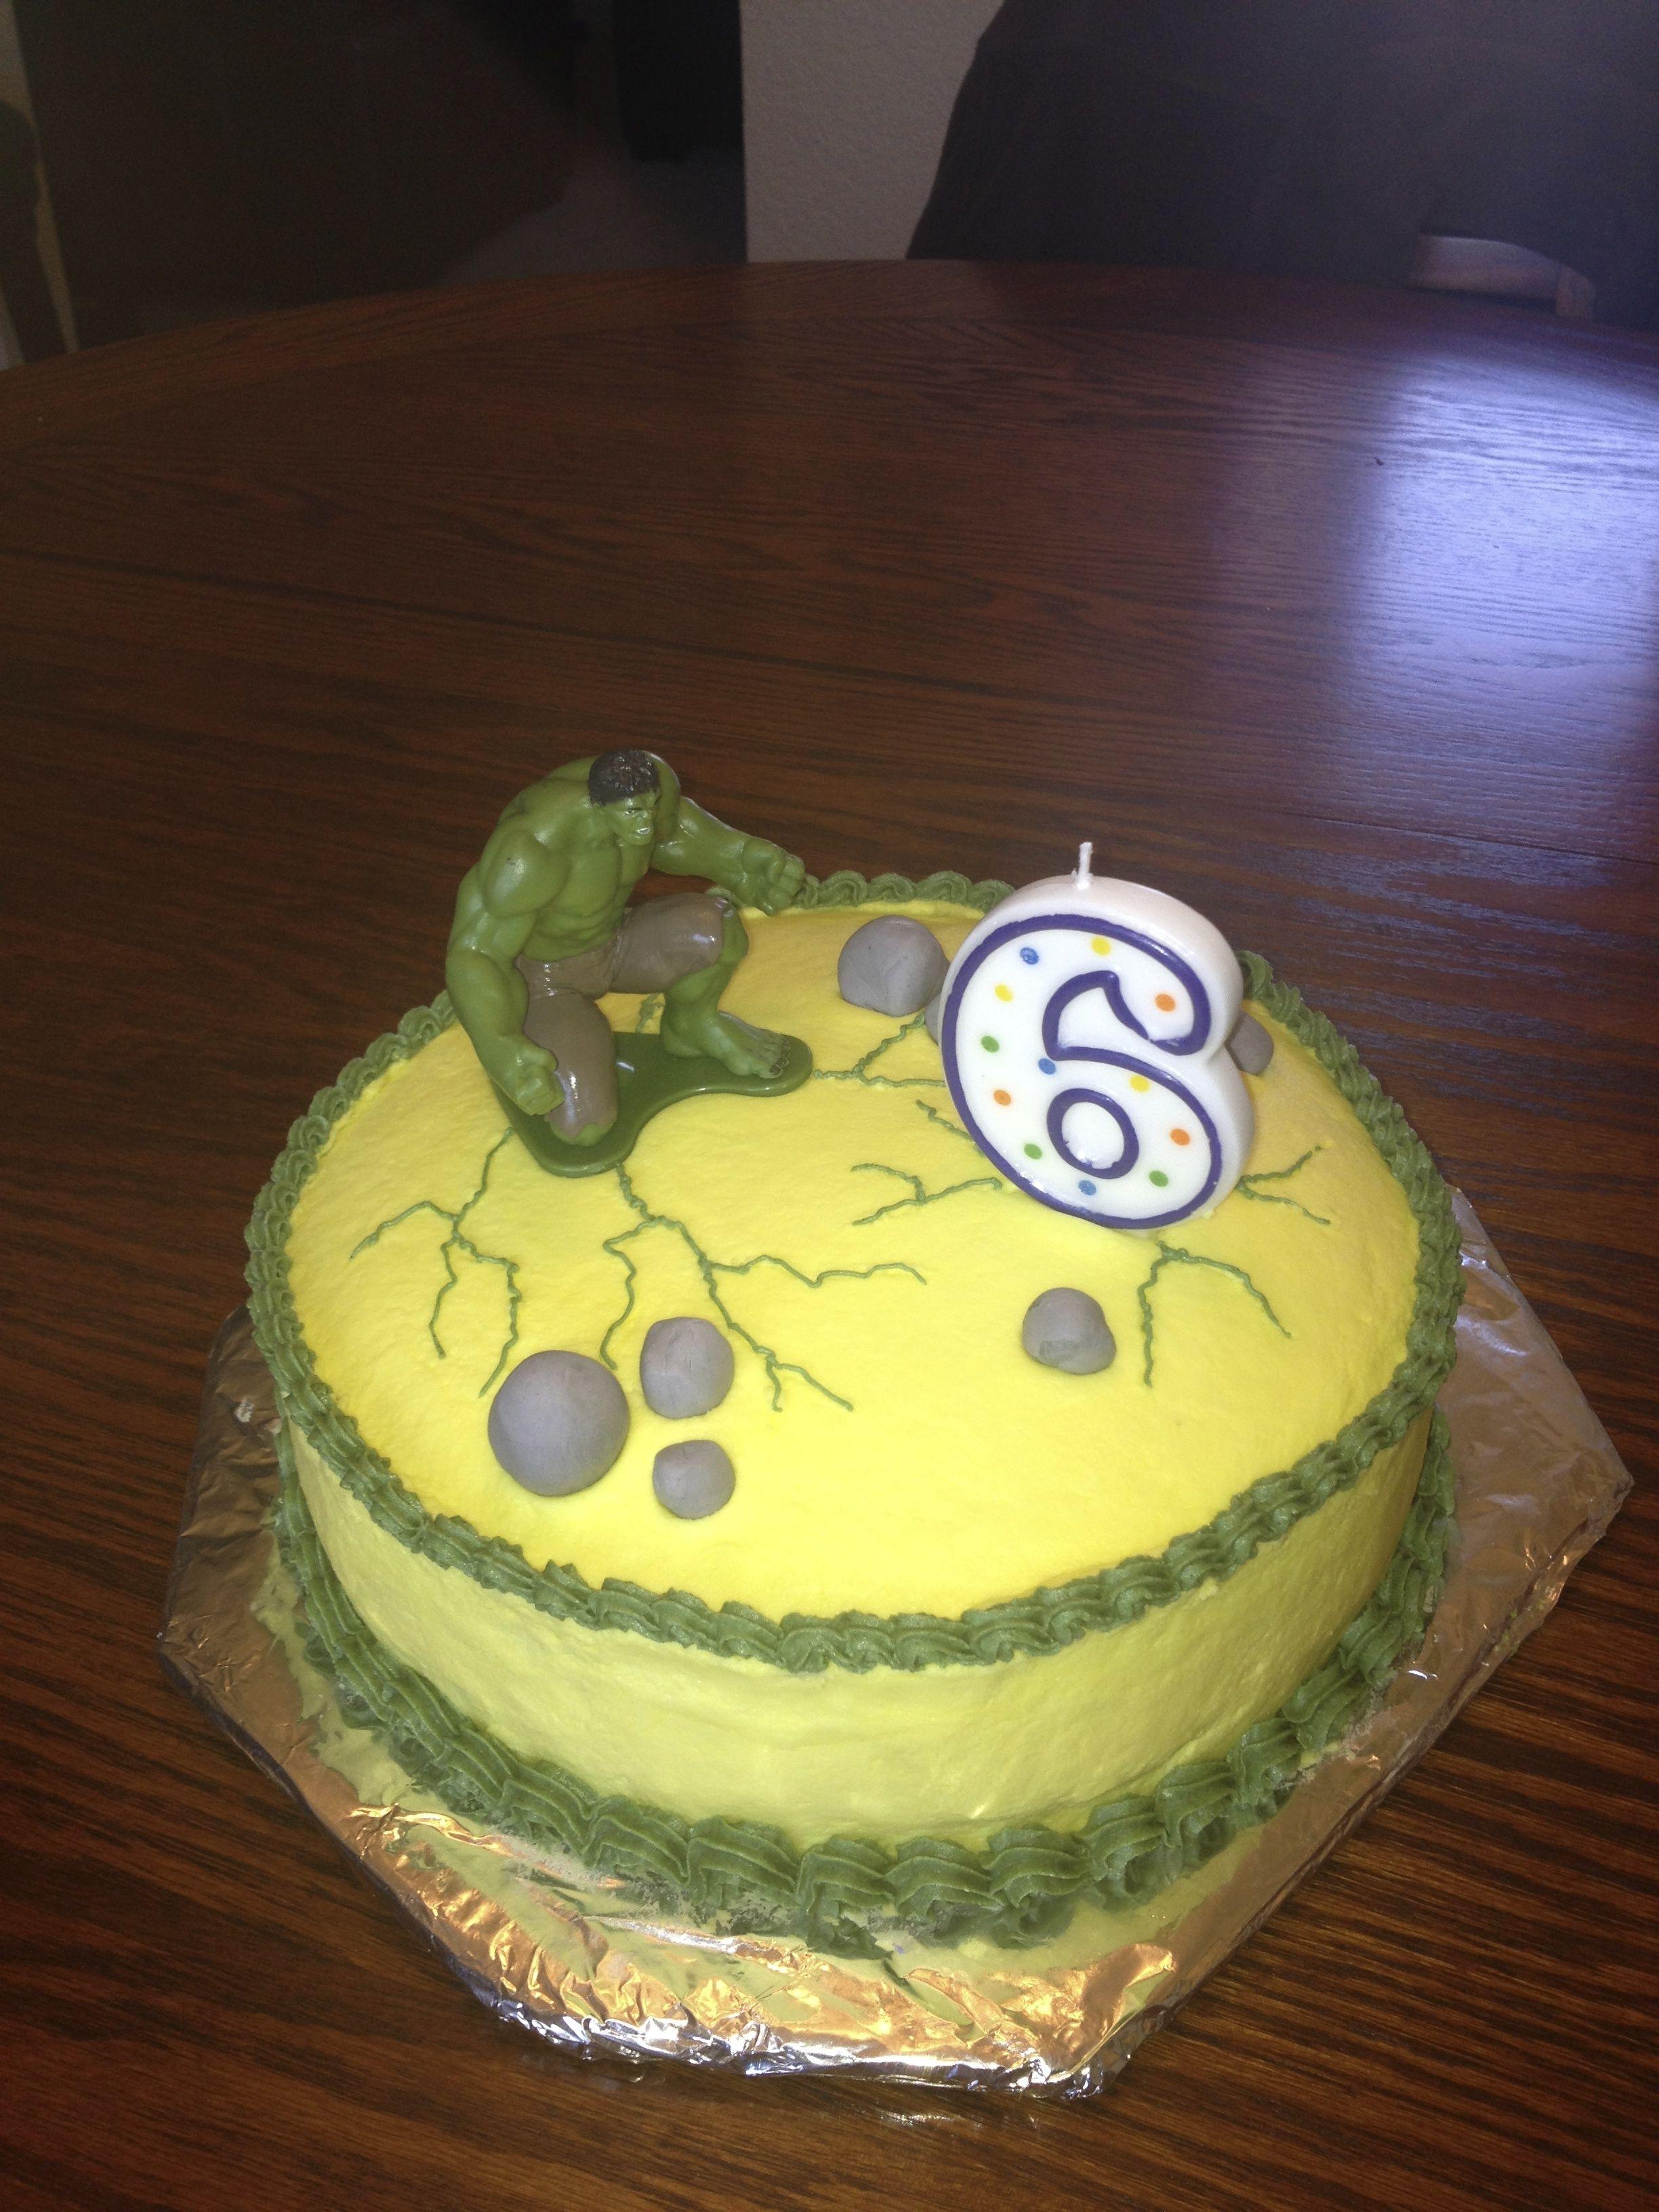 Cake Design Hulk : Hulk birthday cake Cakes! :) Pinterest